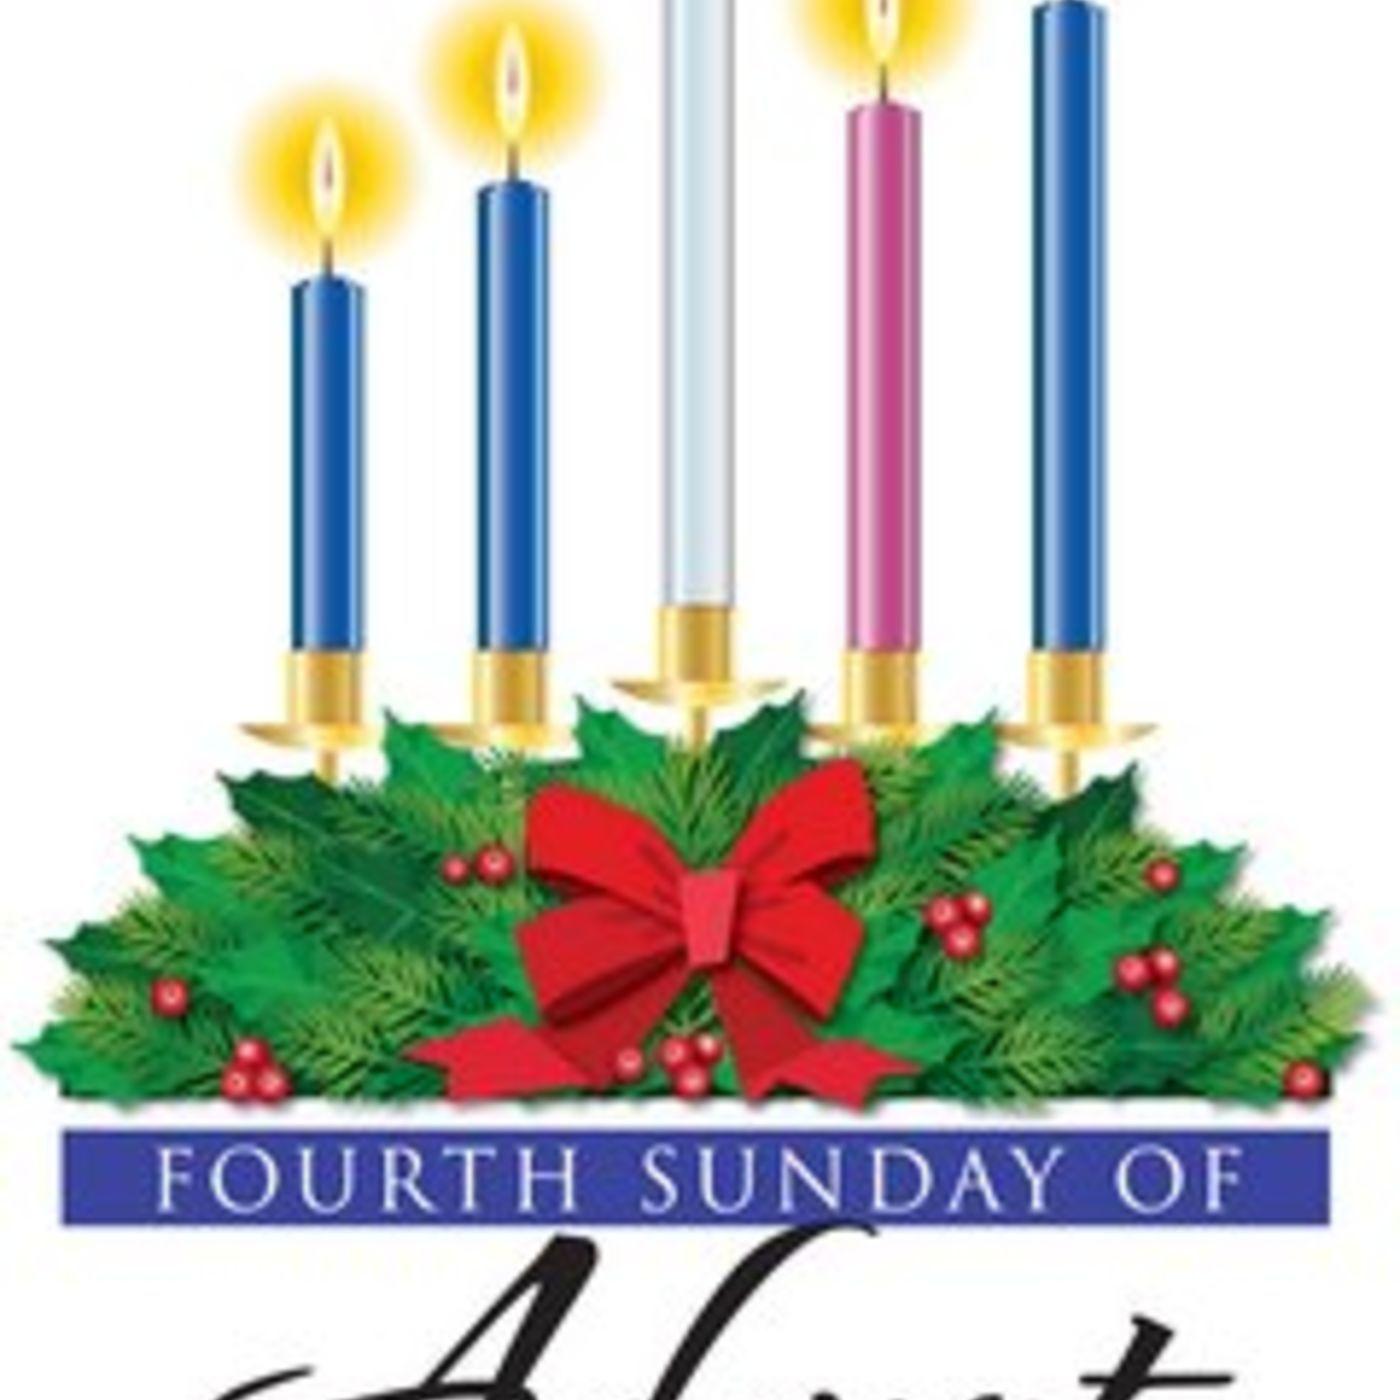 Christmas Eve Service - Fourth Sunday of Advent - Adulation